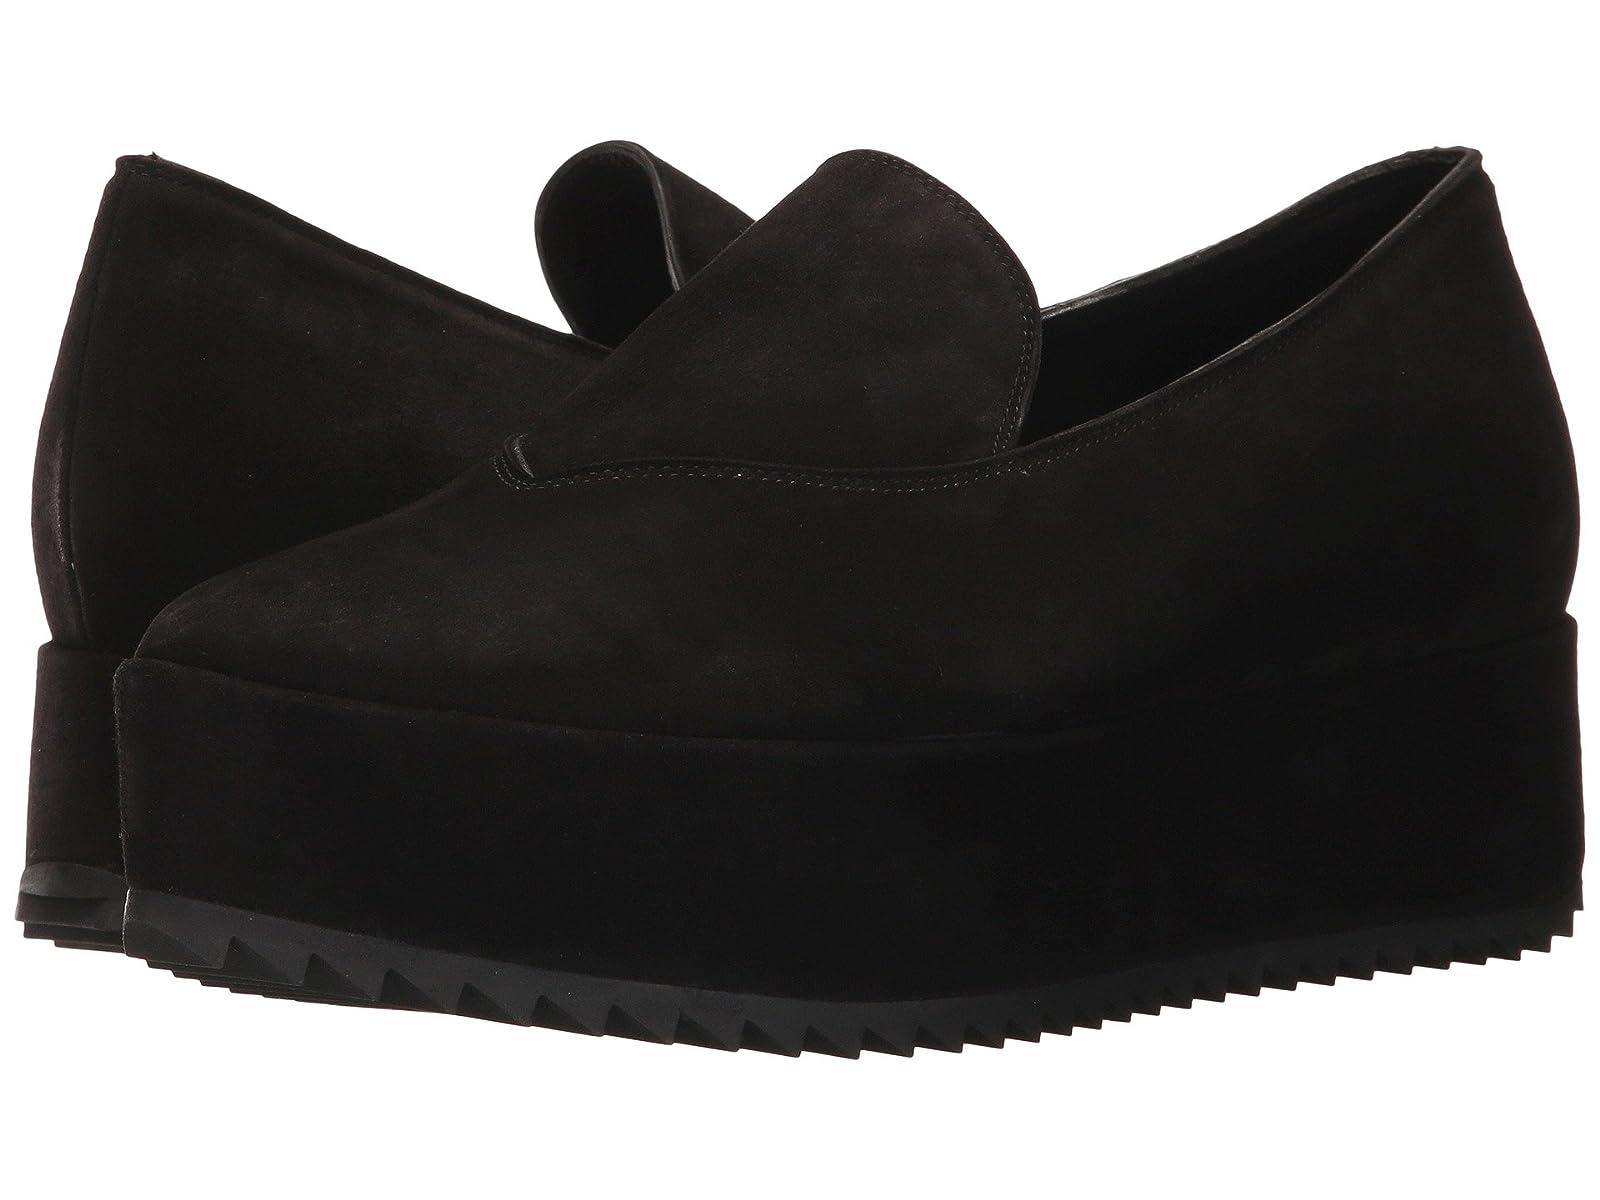 Pedro Garcia NannaCheap and distinctive eye-catching shoes